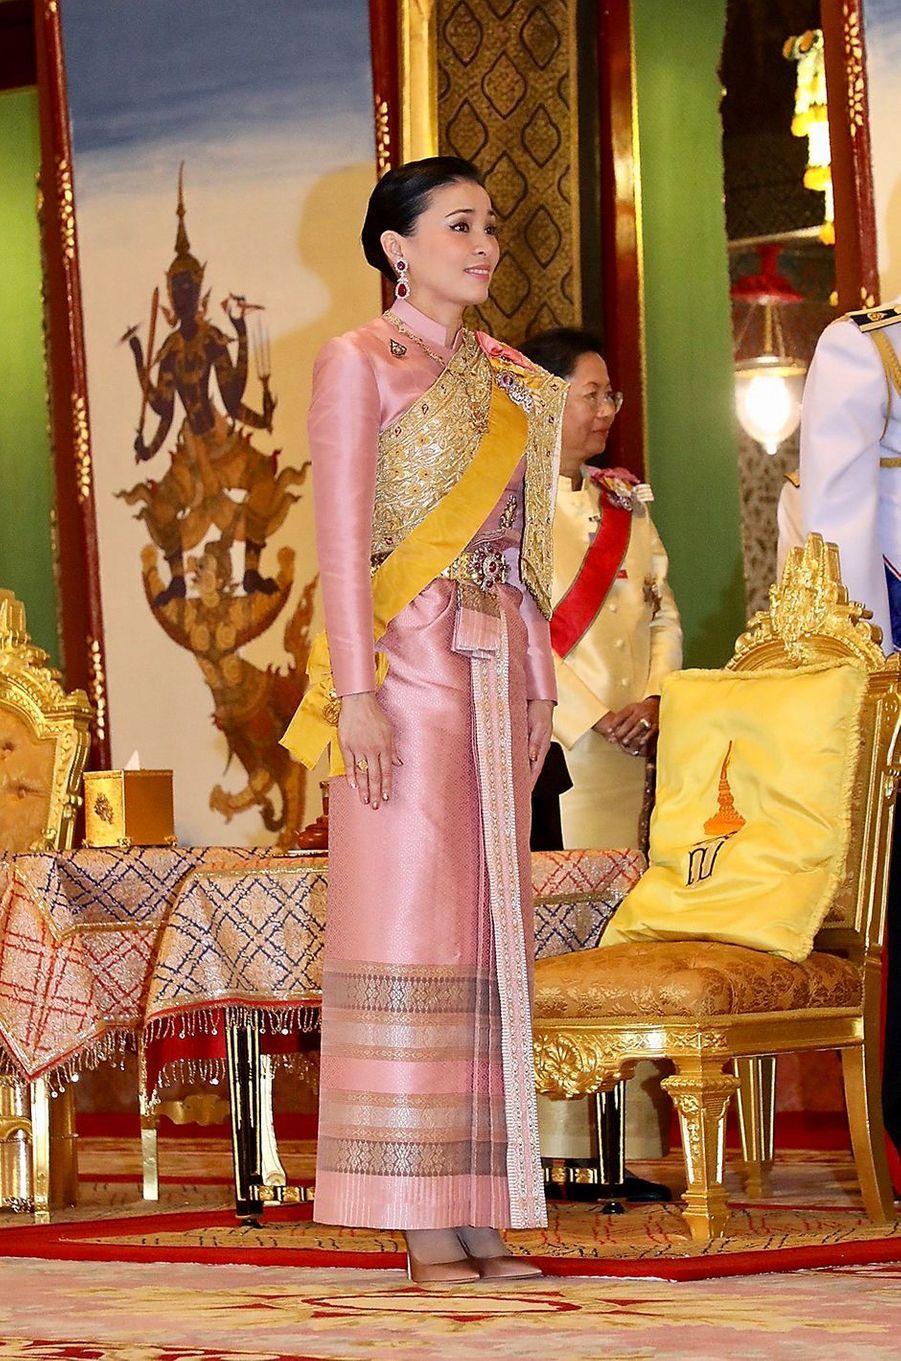 La reine Suthida de Thaïlande Maha Vajiralongkorn à Bangkok, le 4 mai 2019